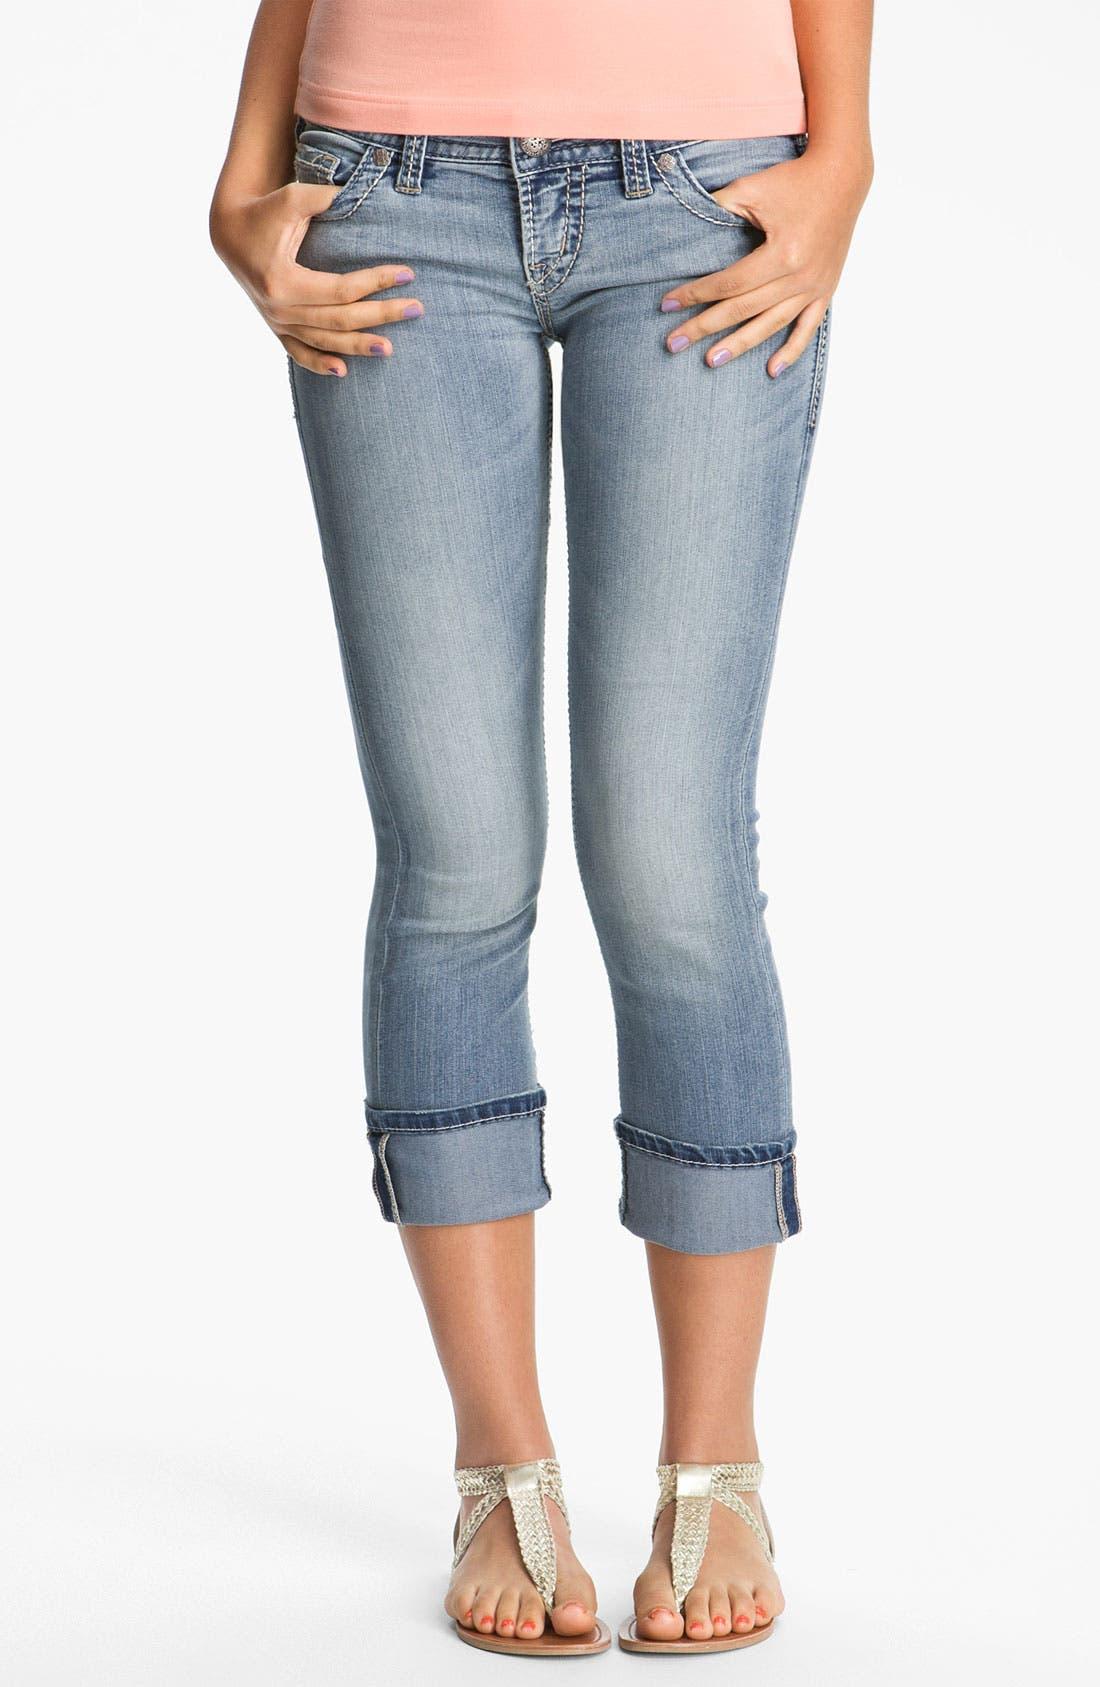 SILVER JEANS CO. Silver Jeans 'Santorini' Crop Stretch Jeans, Main, color, 402